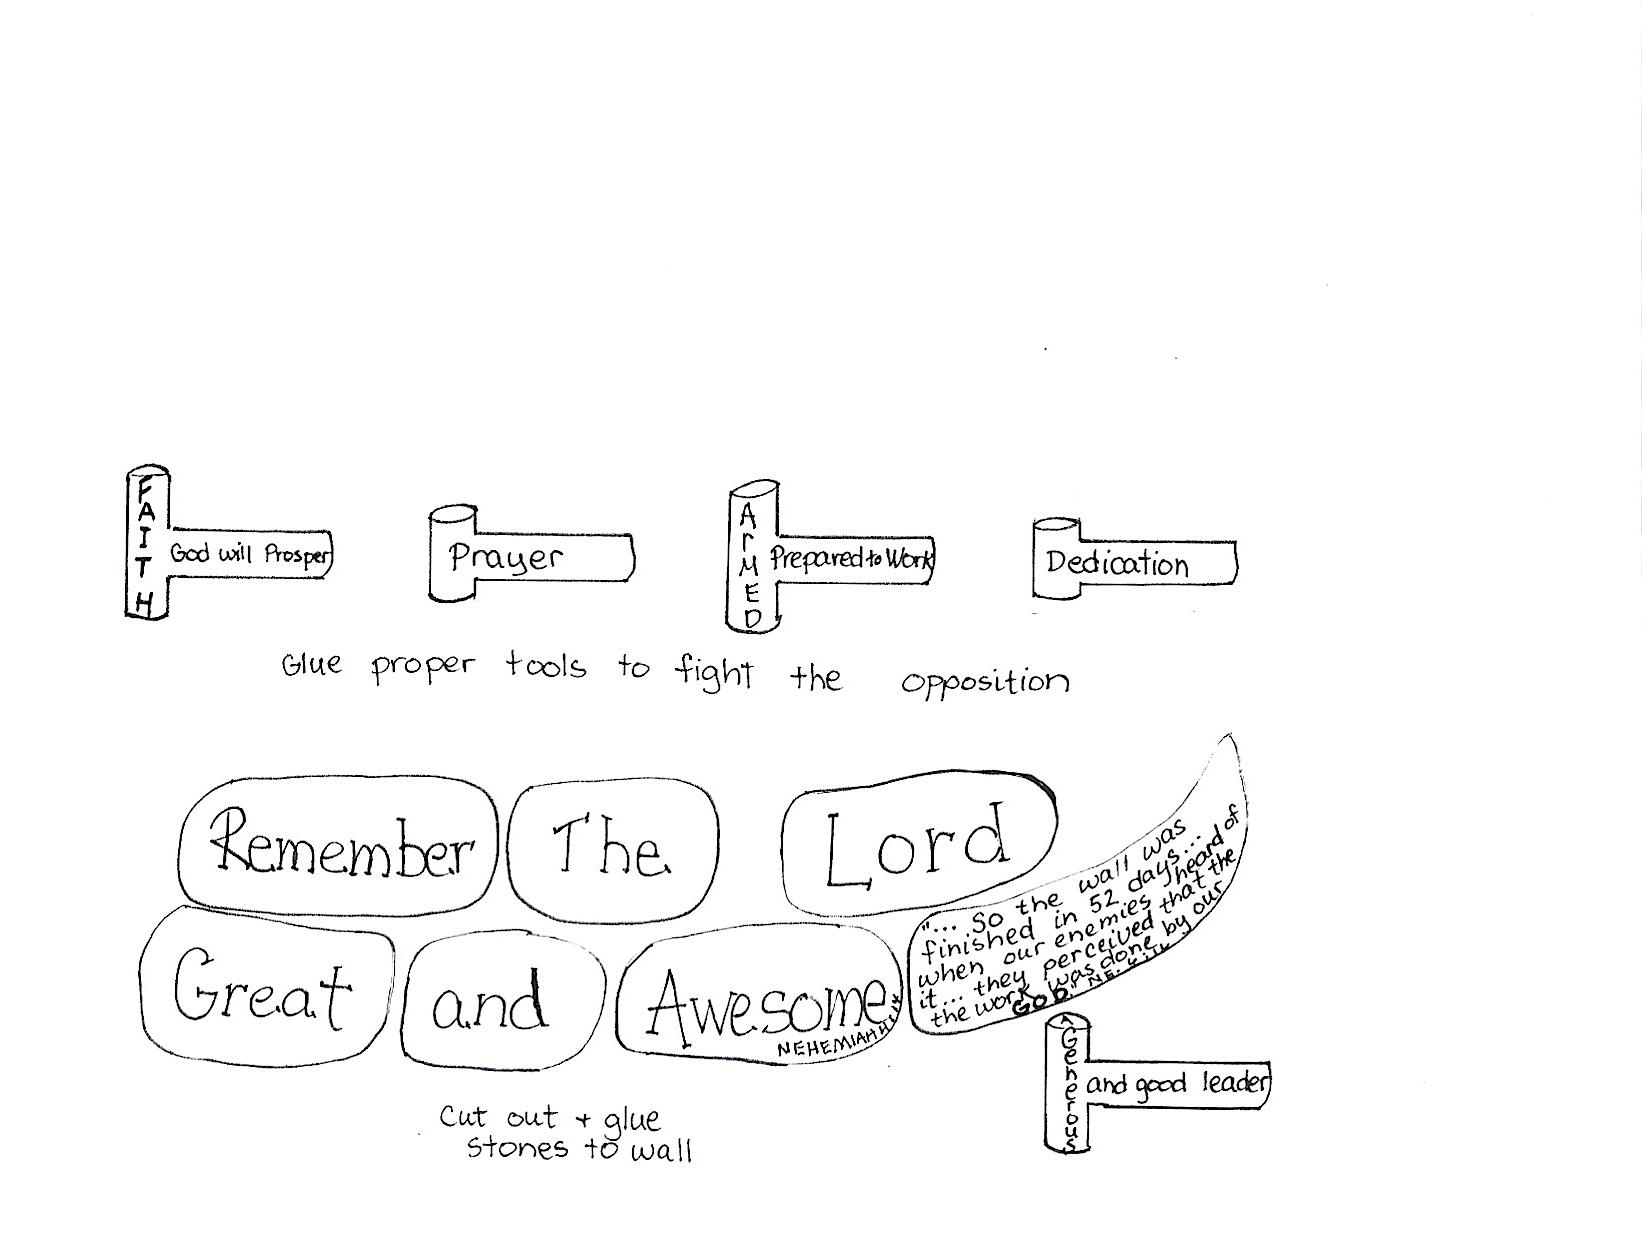 Nehemiah Restores Hope